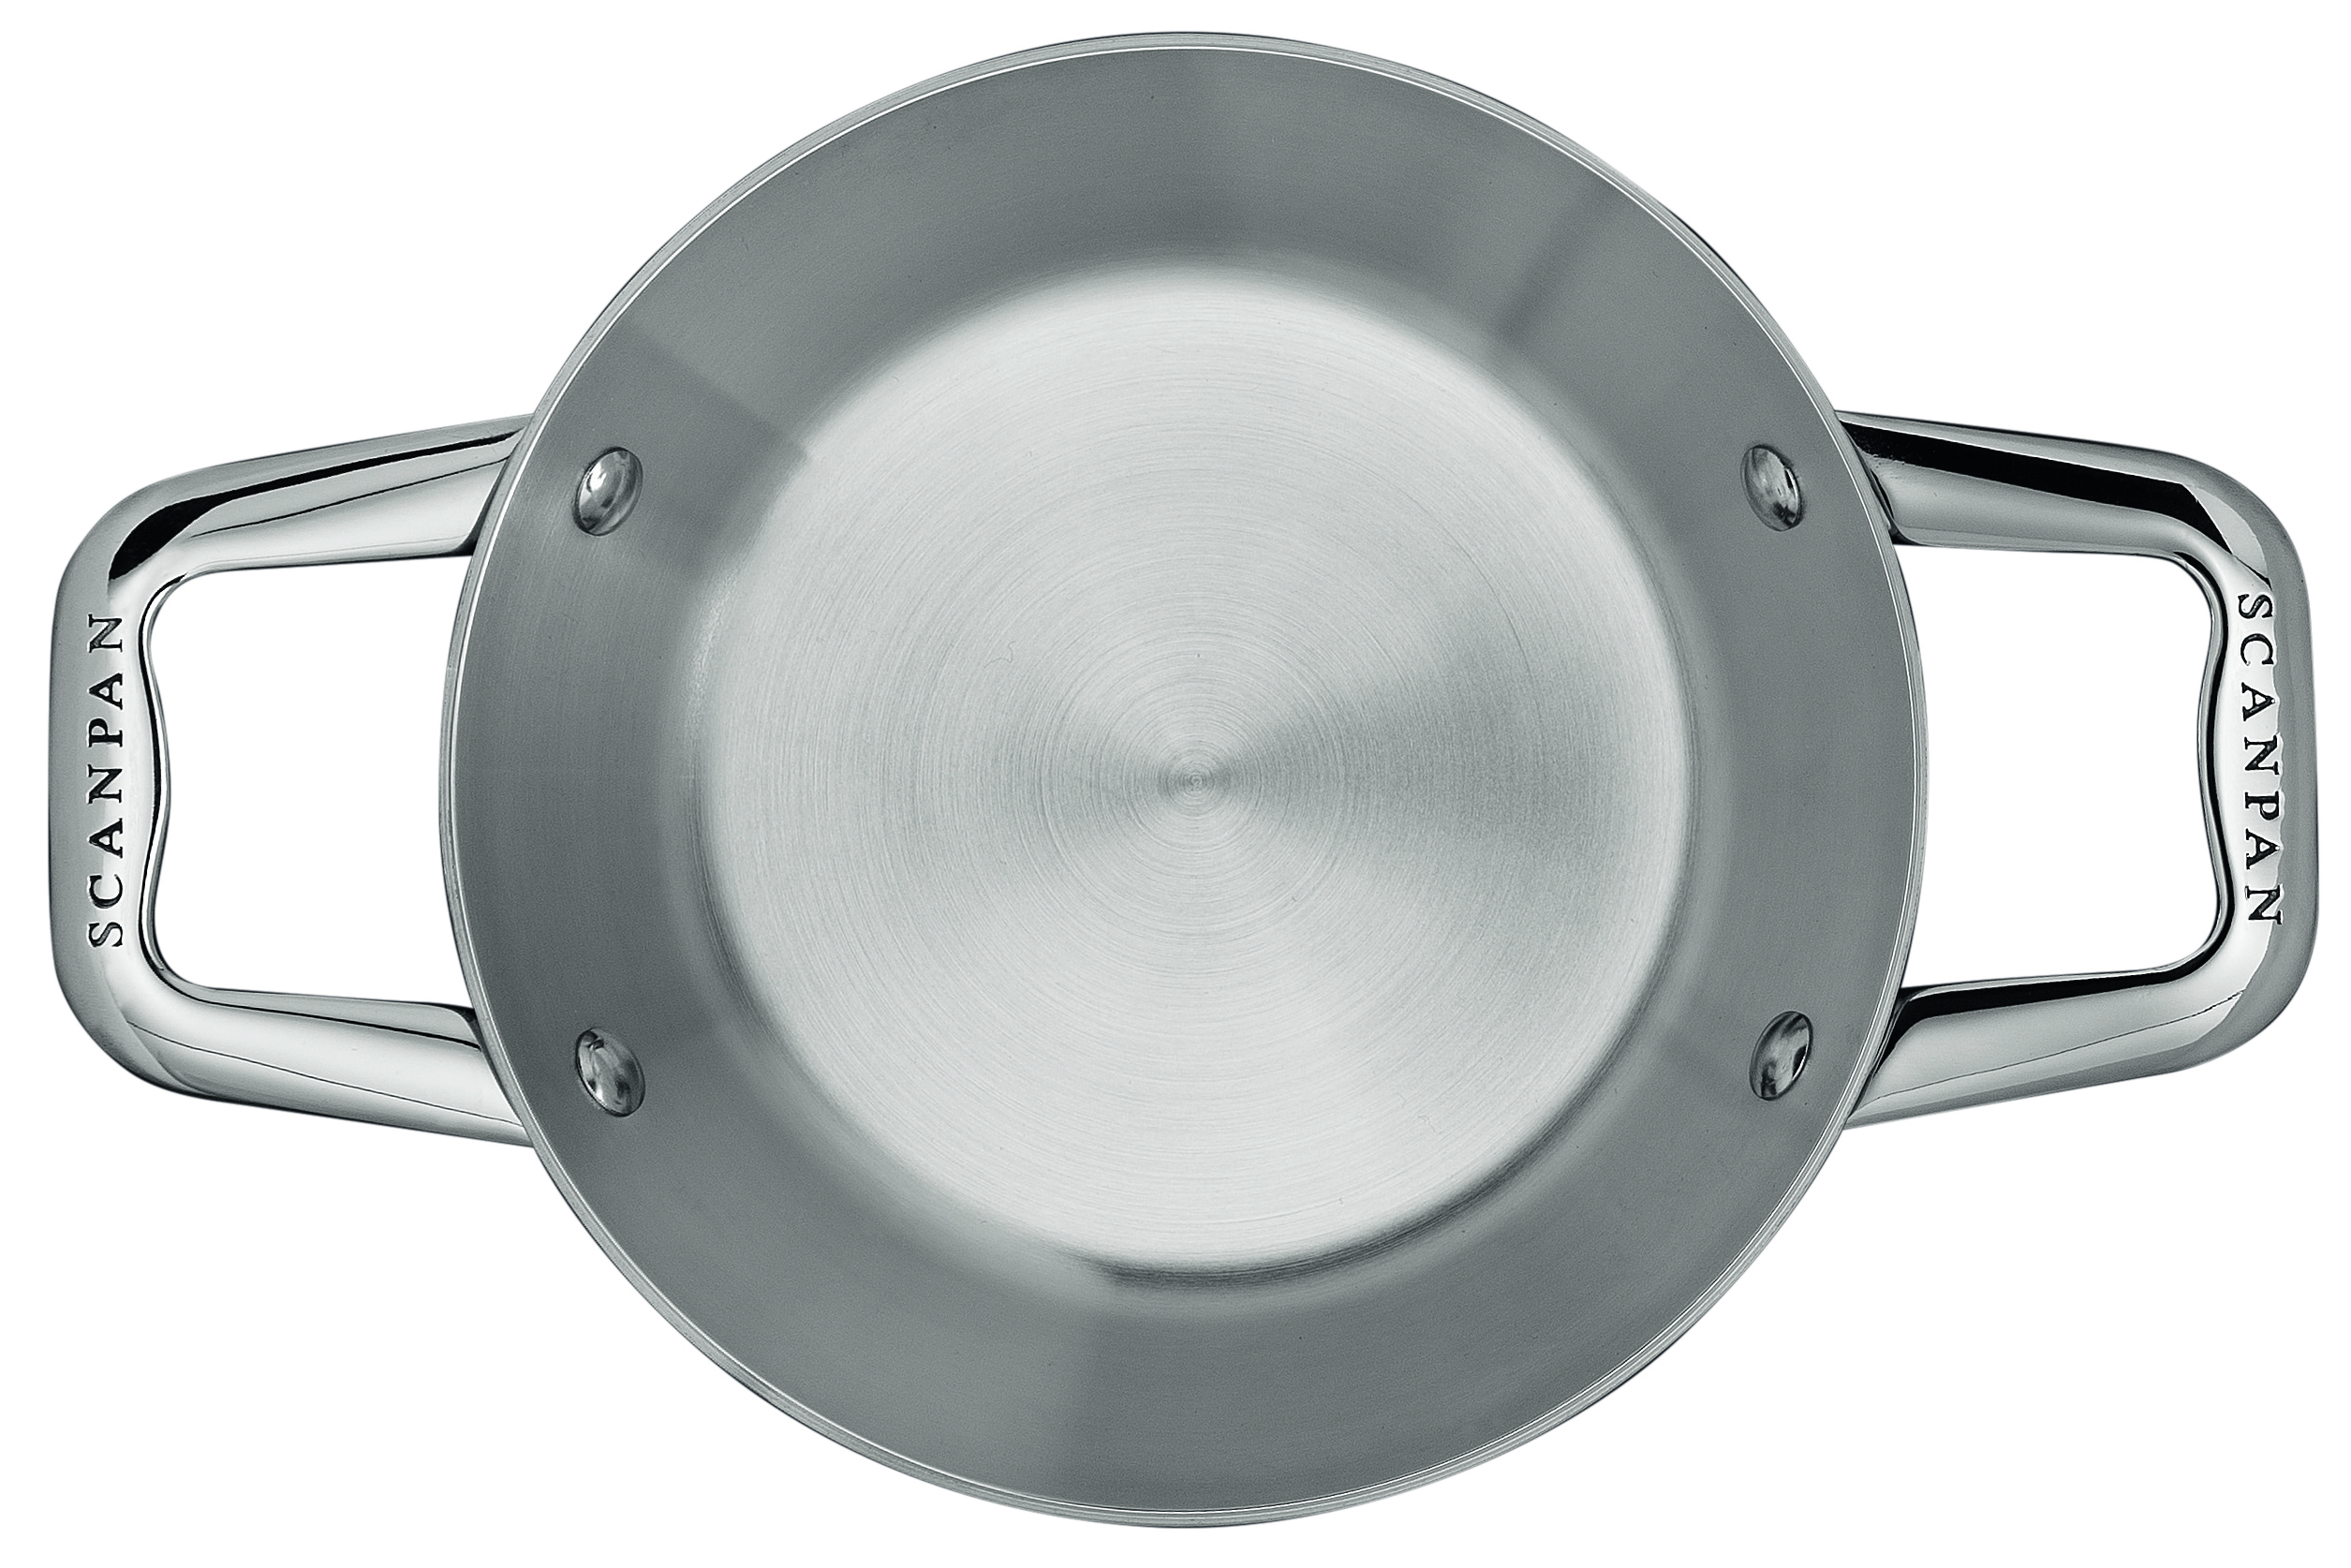 16cmMini paellapande-Maitre D Steel, 16 cm